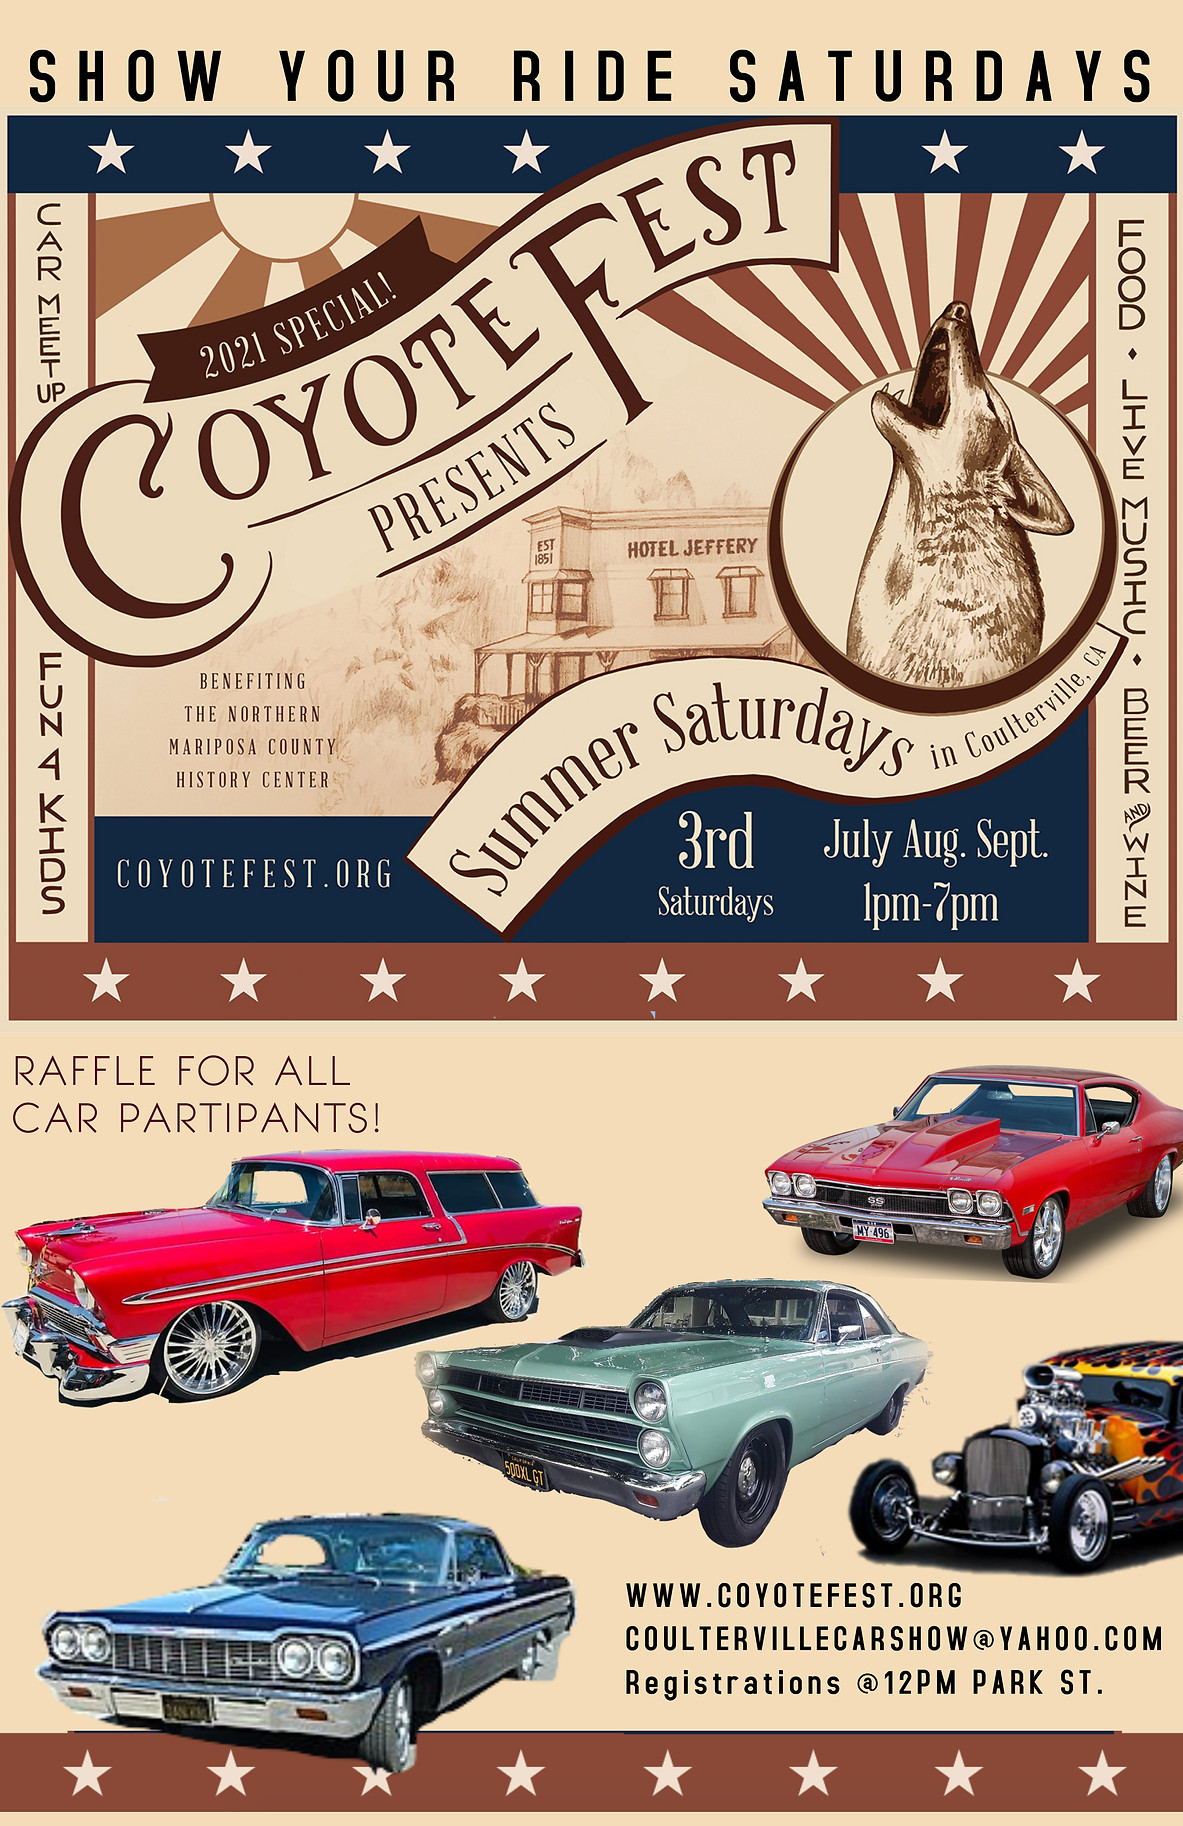 Copy of Car Show Poster.jpg